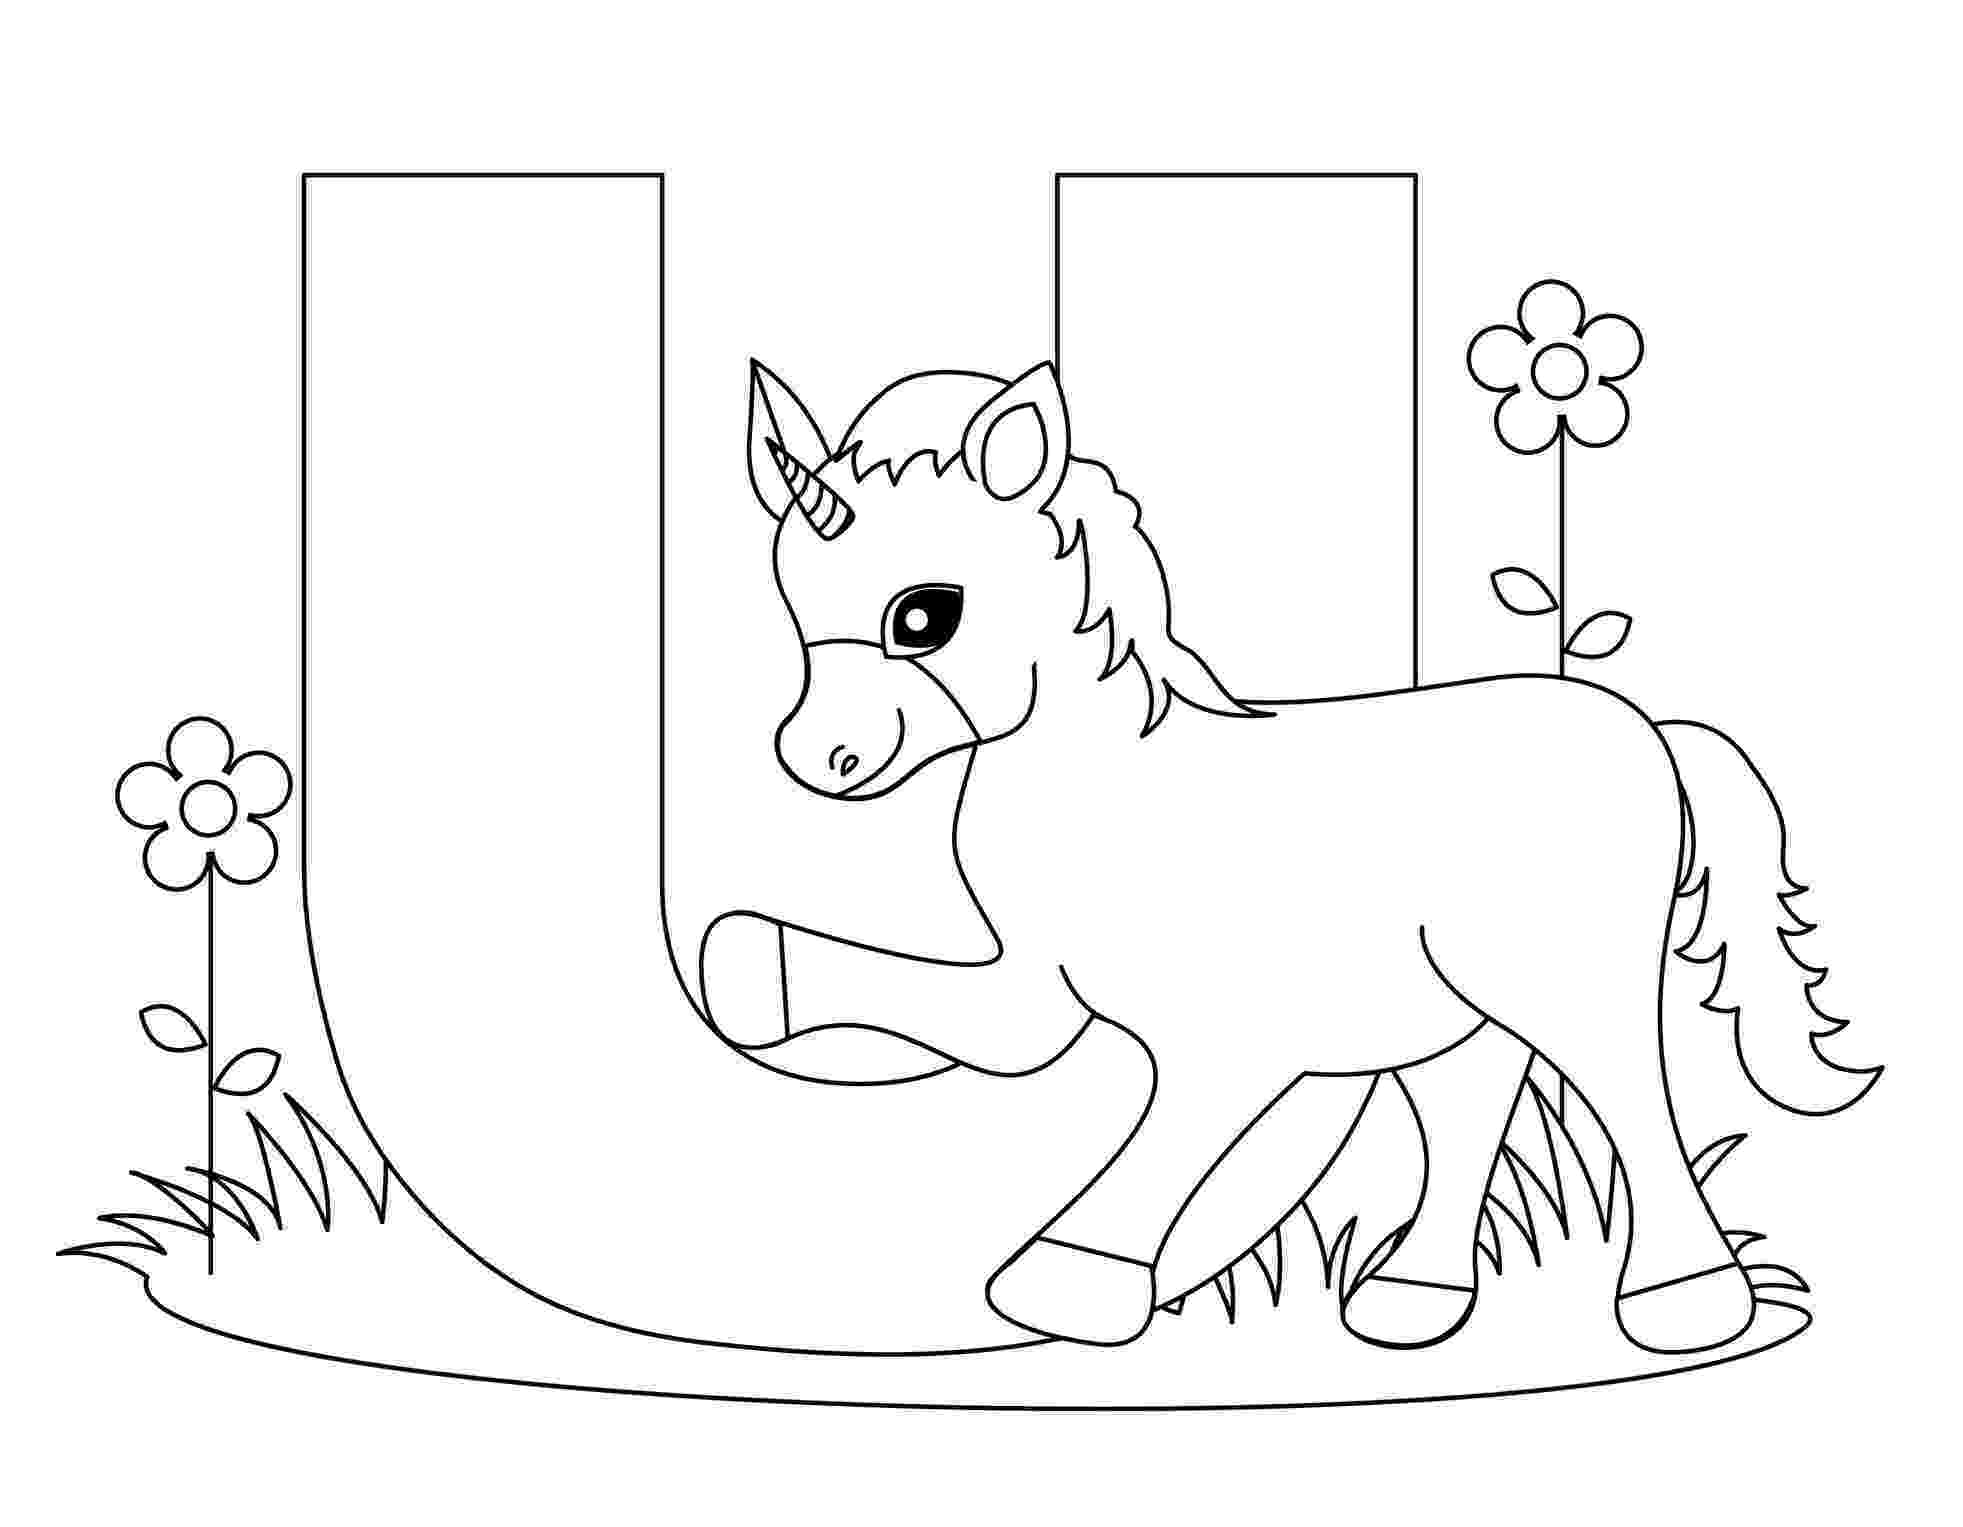 alphabet coloring worksheets free printable alphabet coloring pages for kids best coloring alphabet worksheets 1 1